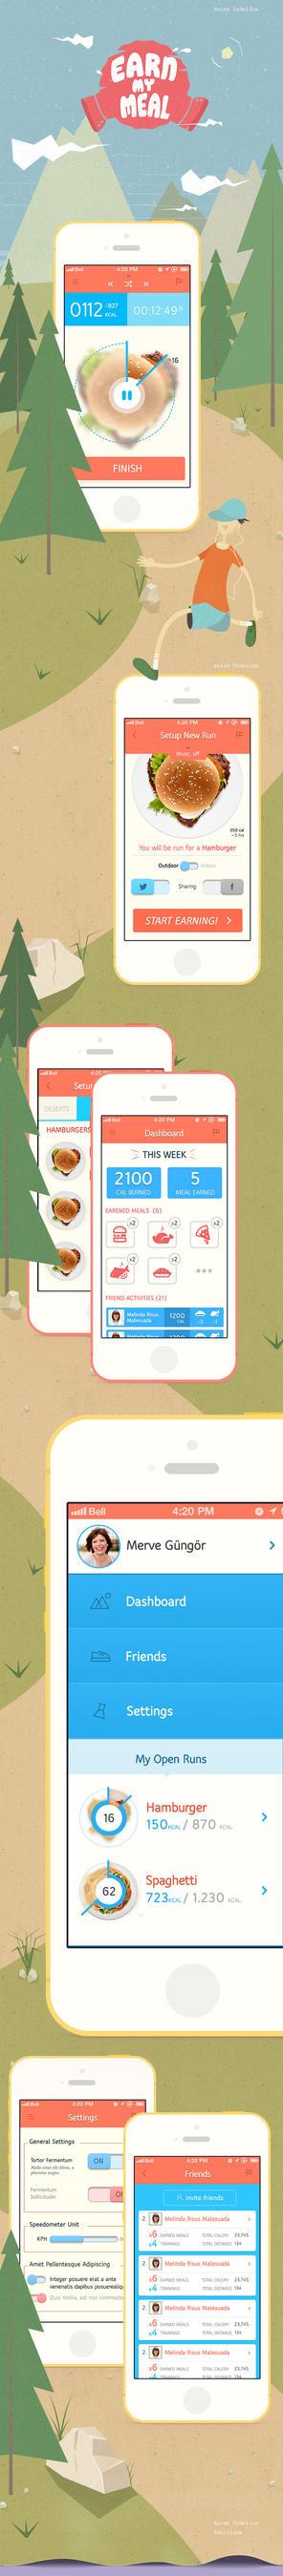 'Earn My Meal' iPhone App UI Design by GoldenBugSpread